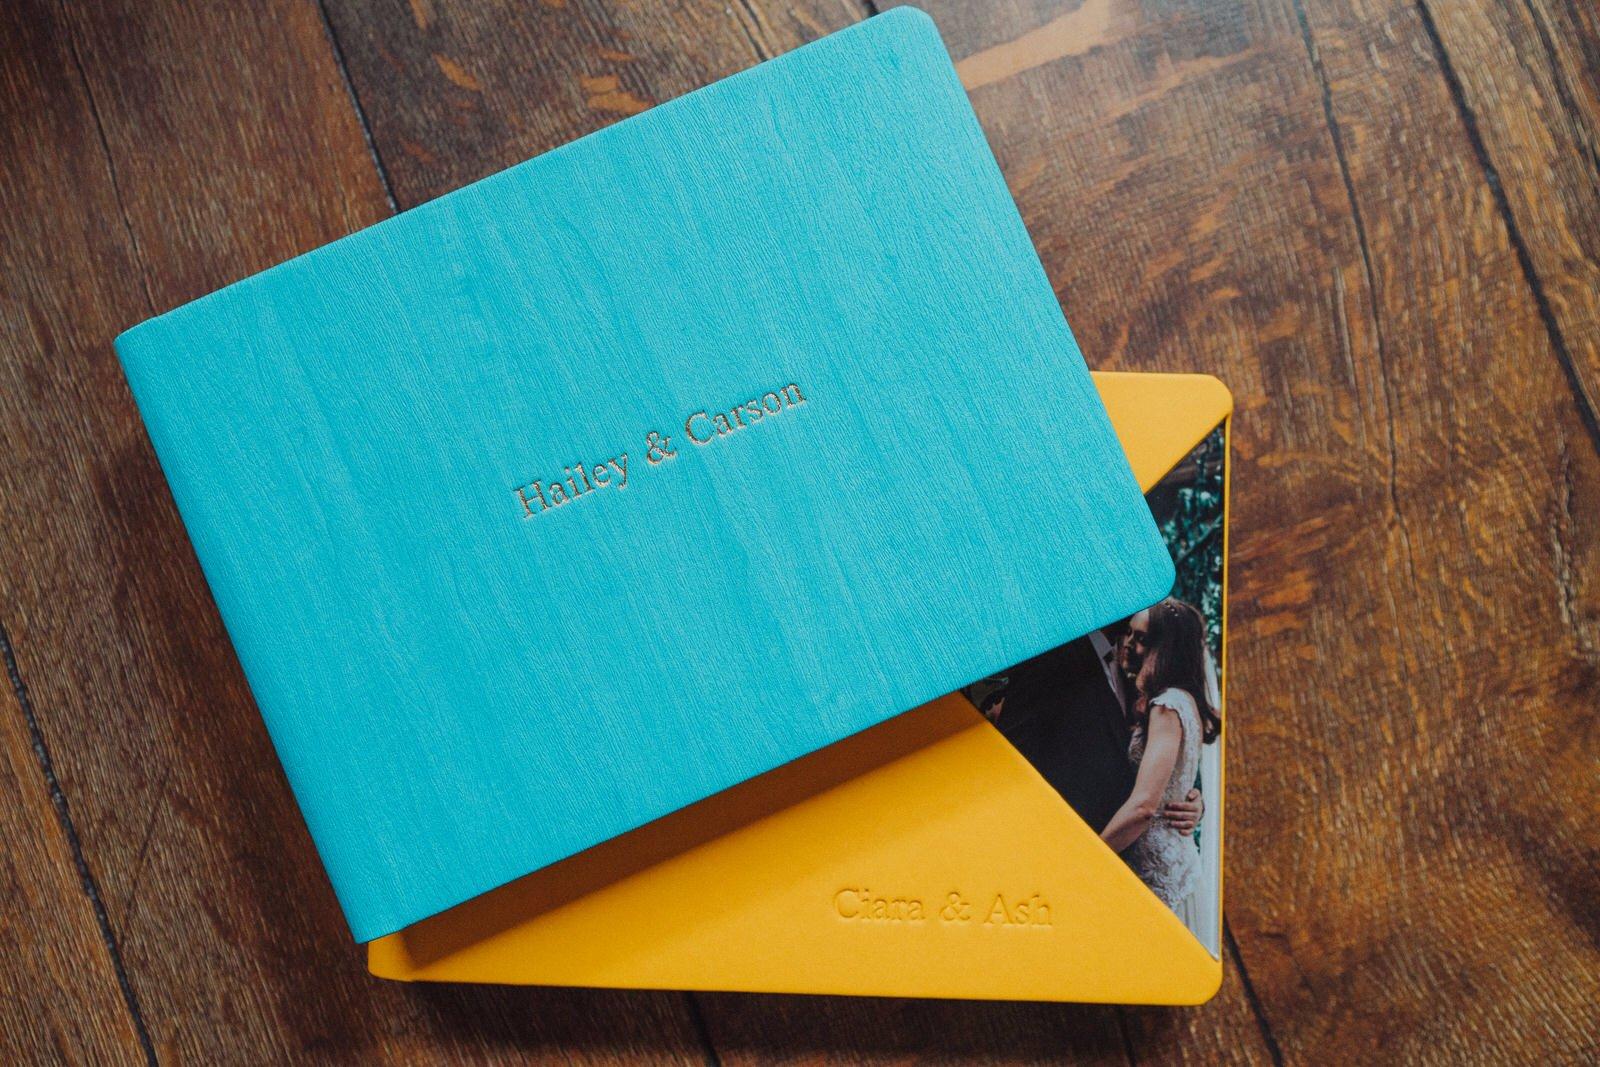 pawel-bebenca-albums-prints16 10